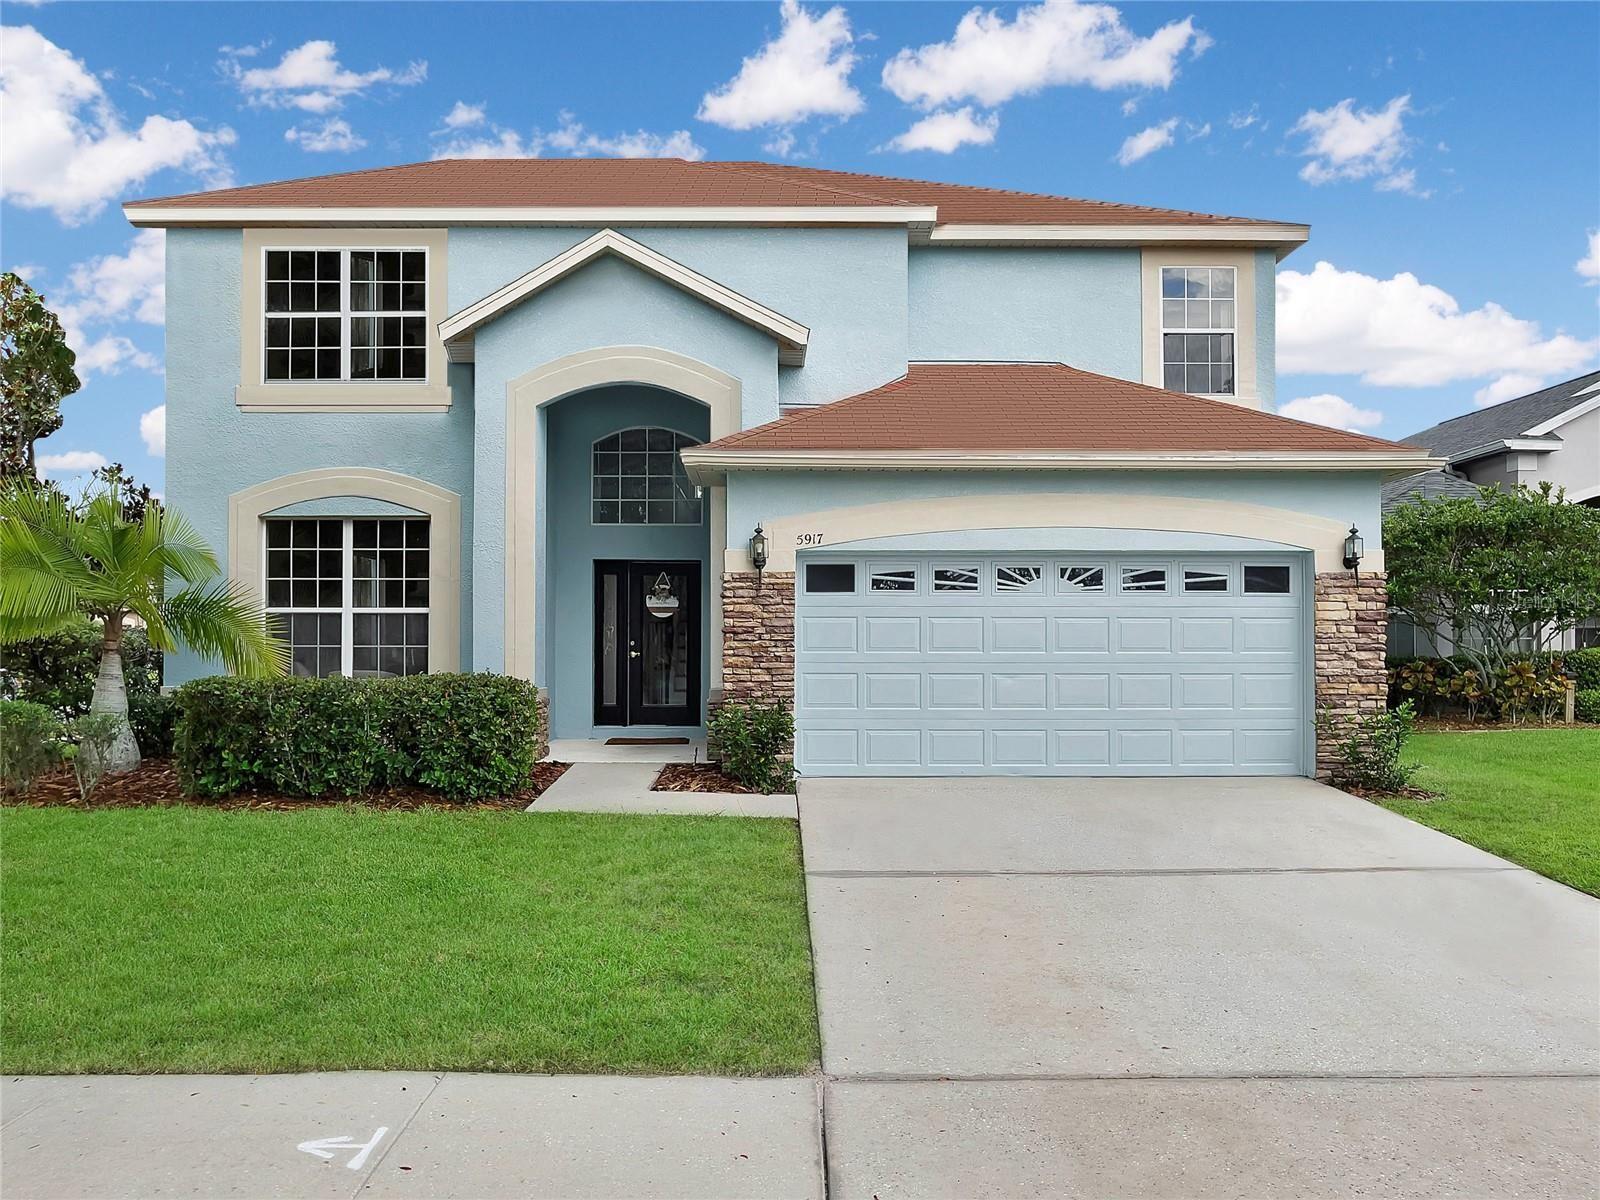 5917 MILFORD HAVEN PLACE, Orlando, FL 32829 - #: O5974105